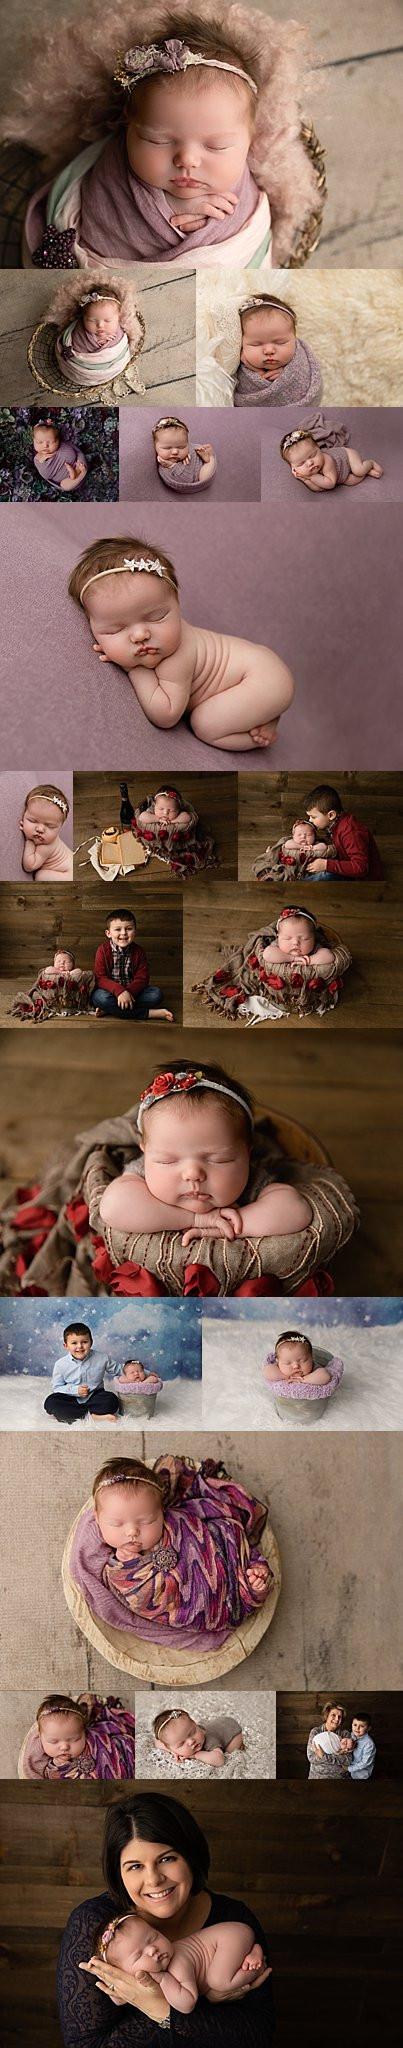 Bergen county NJ Newborn photographer